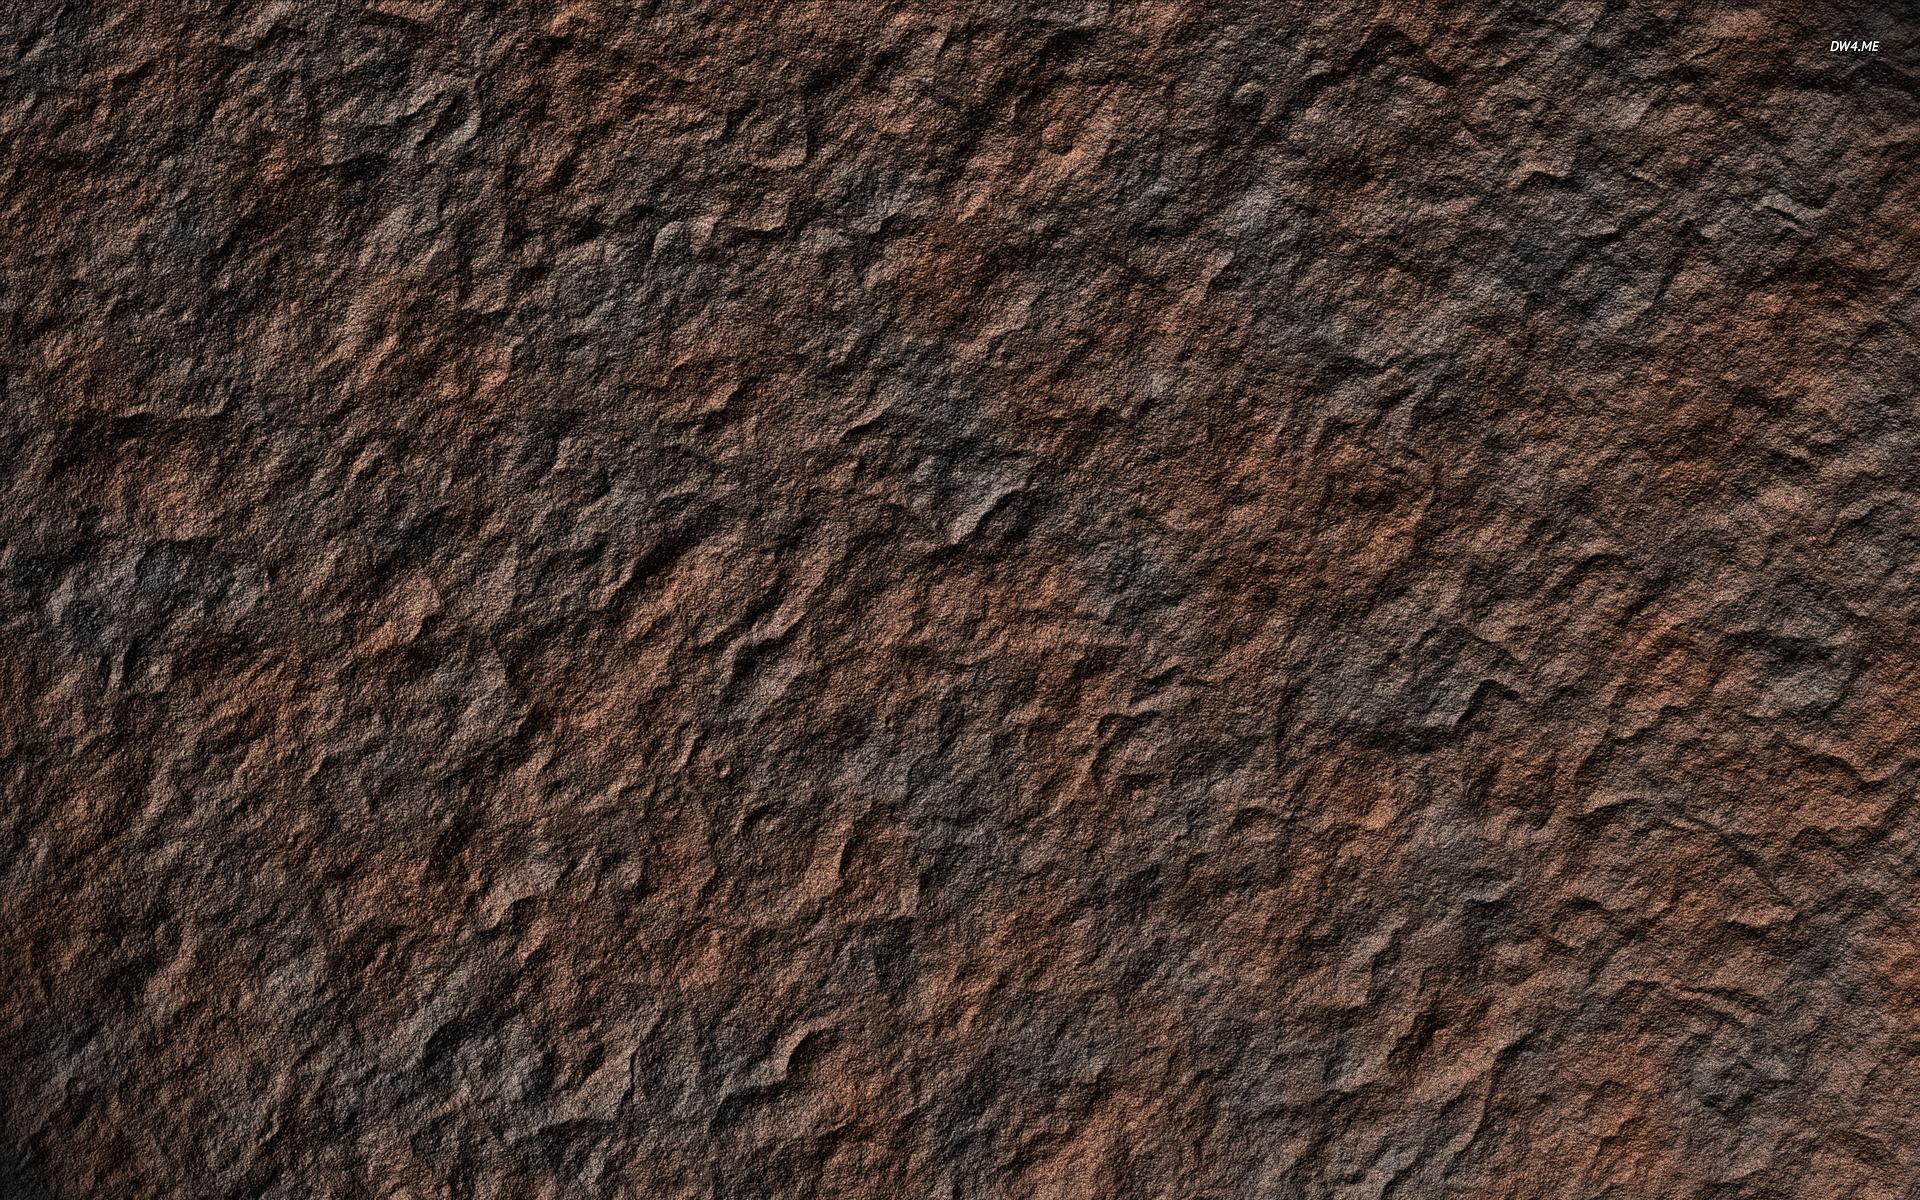 Stone texture wallpaper   Digital Art wallpapers   79 1920x1200